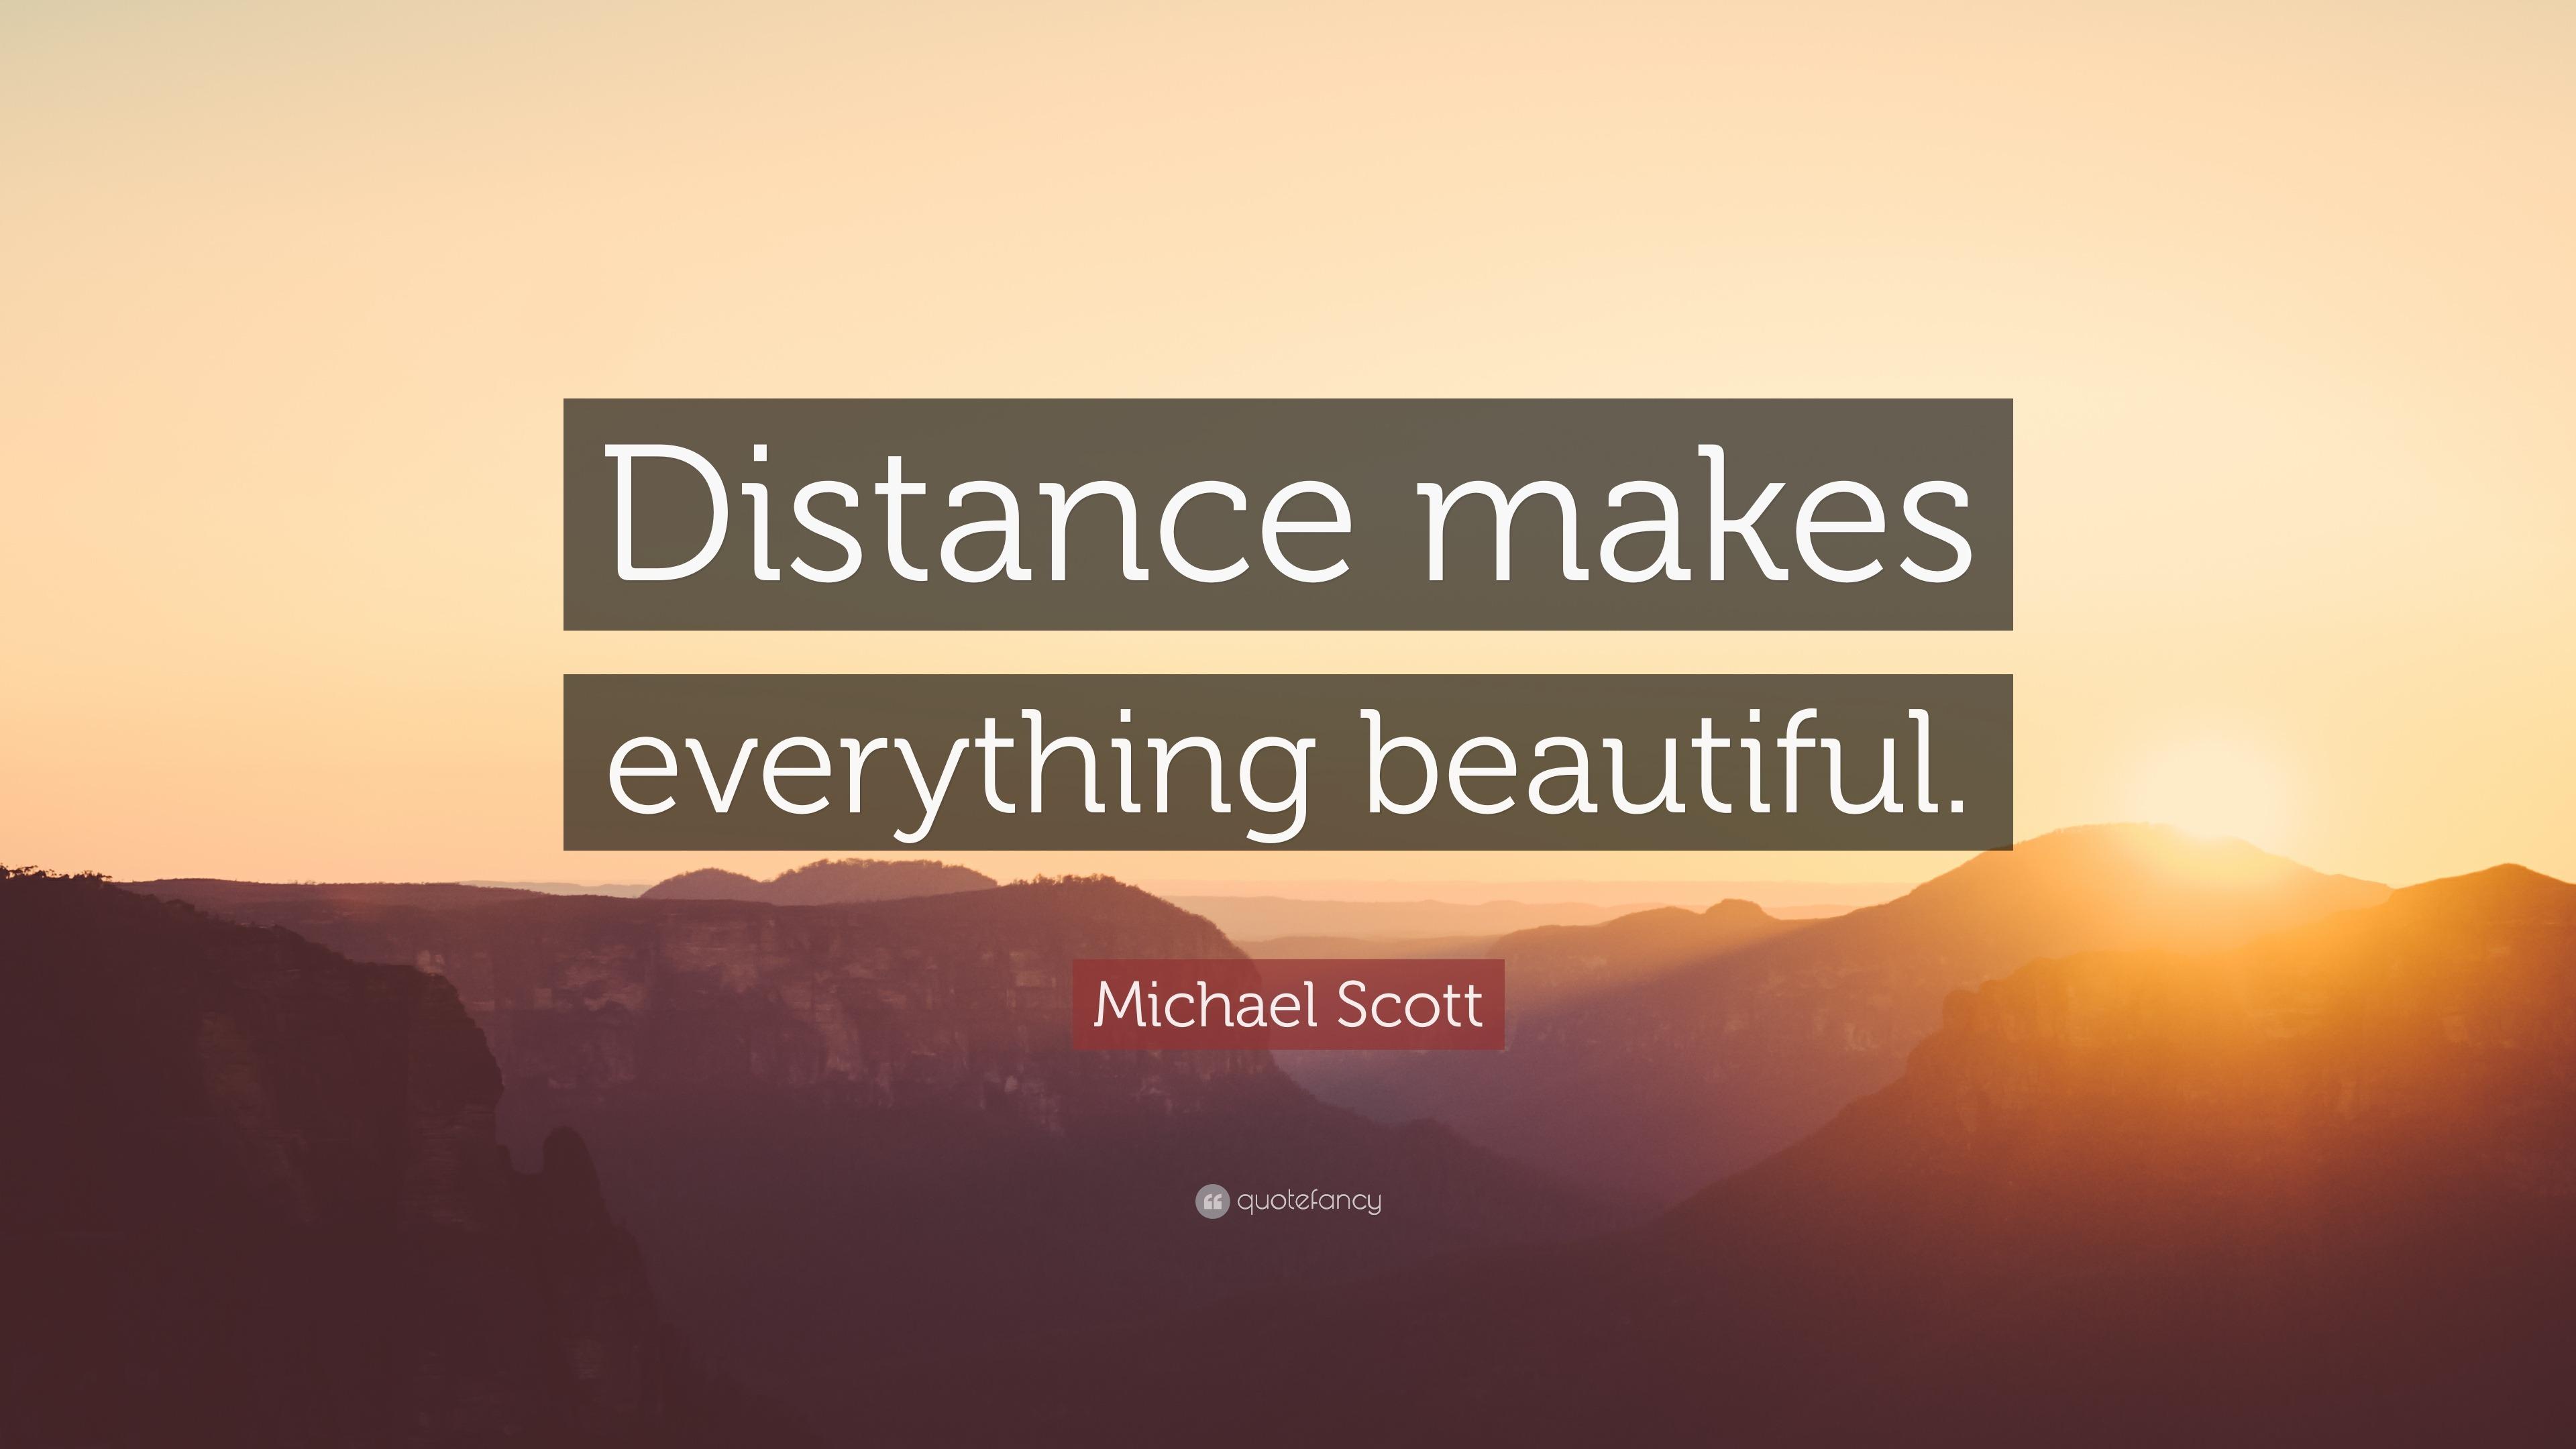 Distance makes